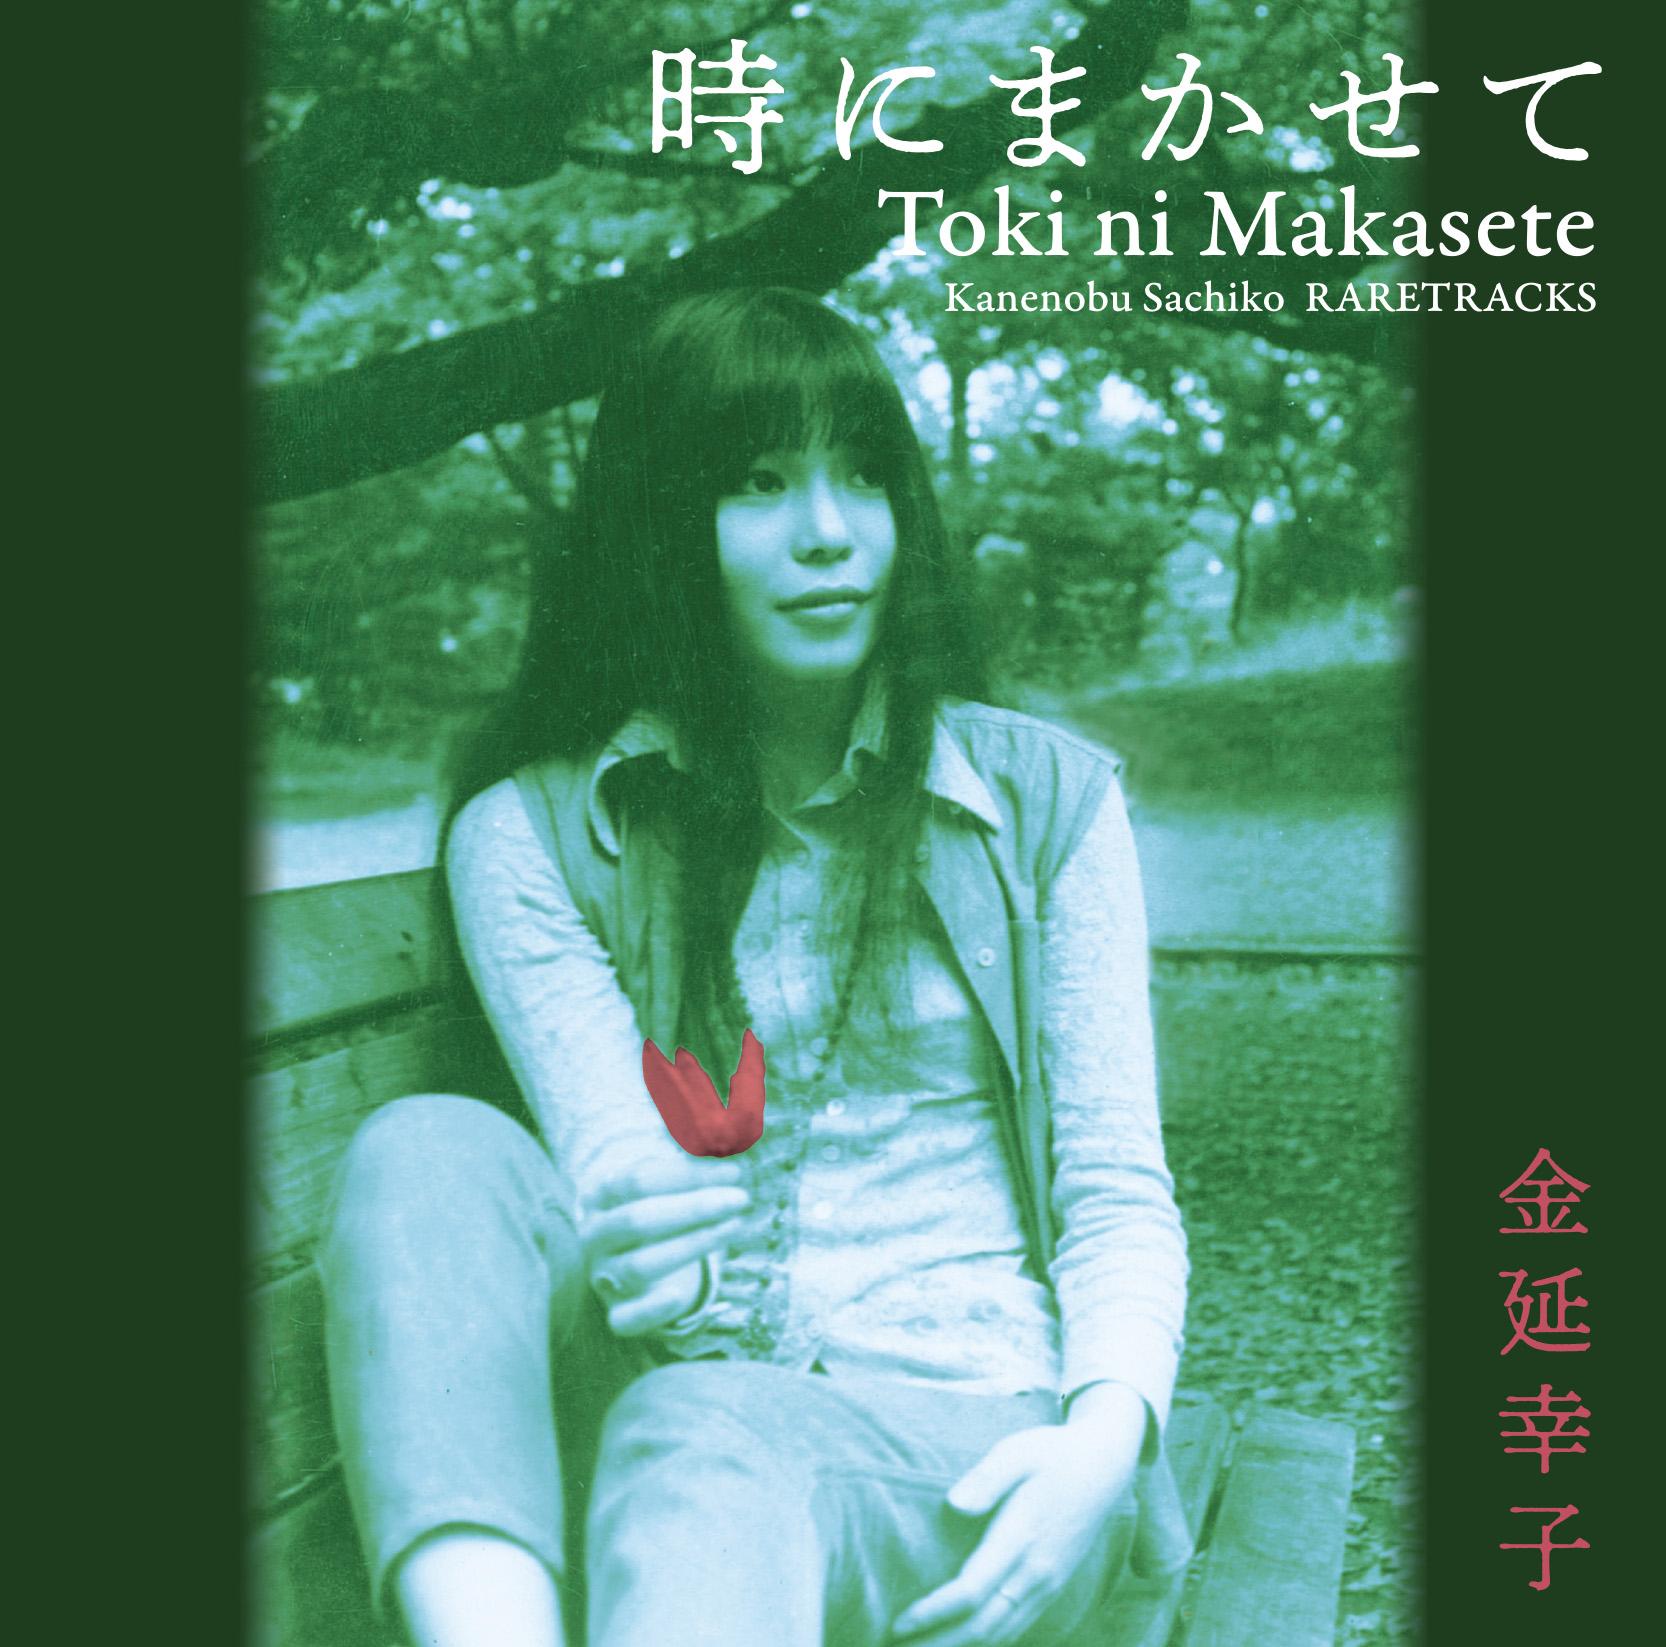 Toki Ni Makasete -Sachiko Kanenobu RARE TRACKS-